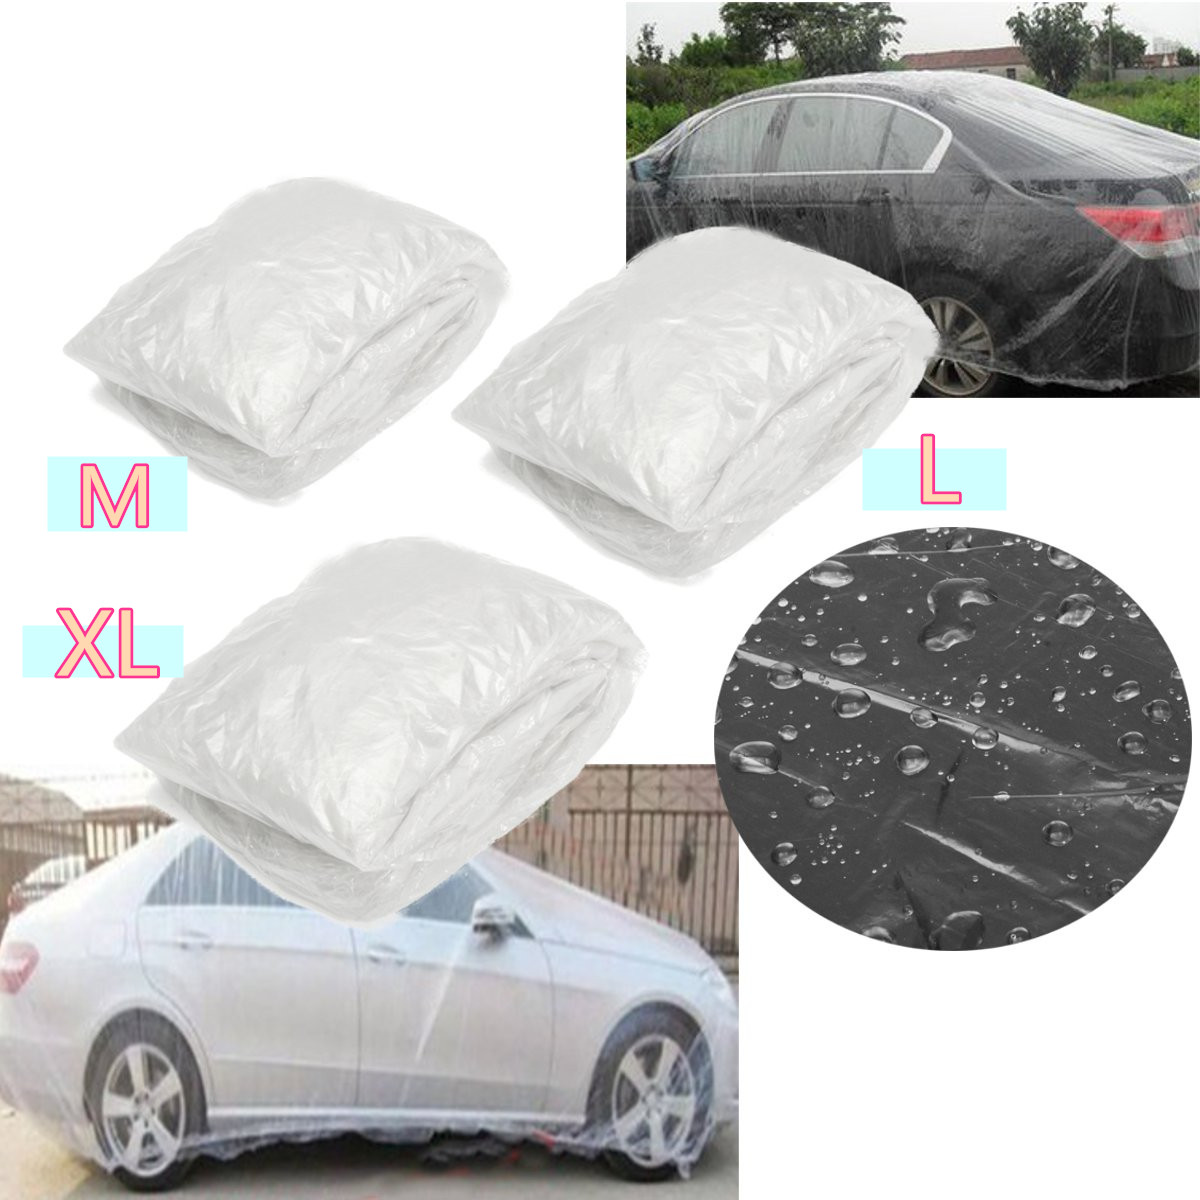 M/L/XL Disposable Car Cover Waterproof Transparent Plastic Dustproof Cover Auto Rain Covers Universal